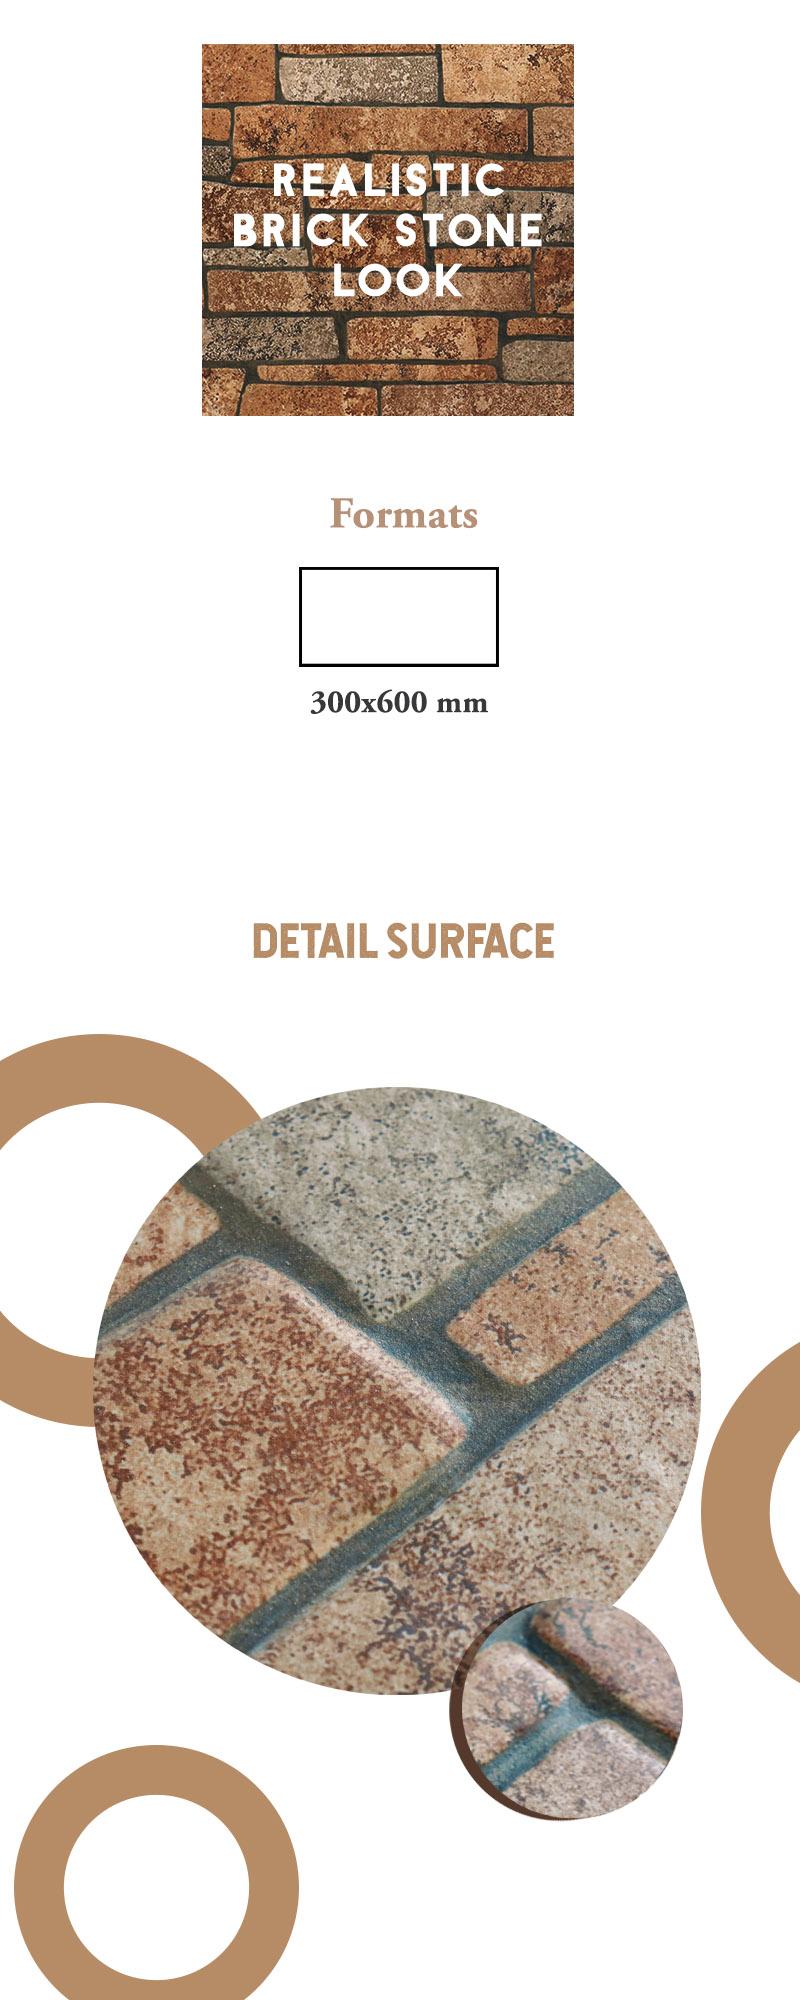 Bric wall slate 300x600 web page